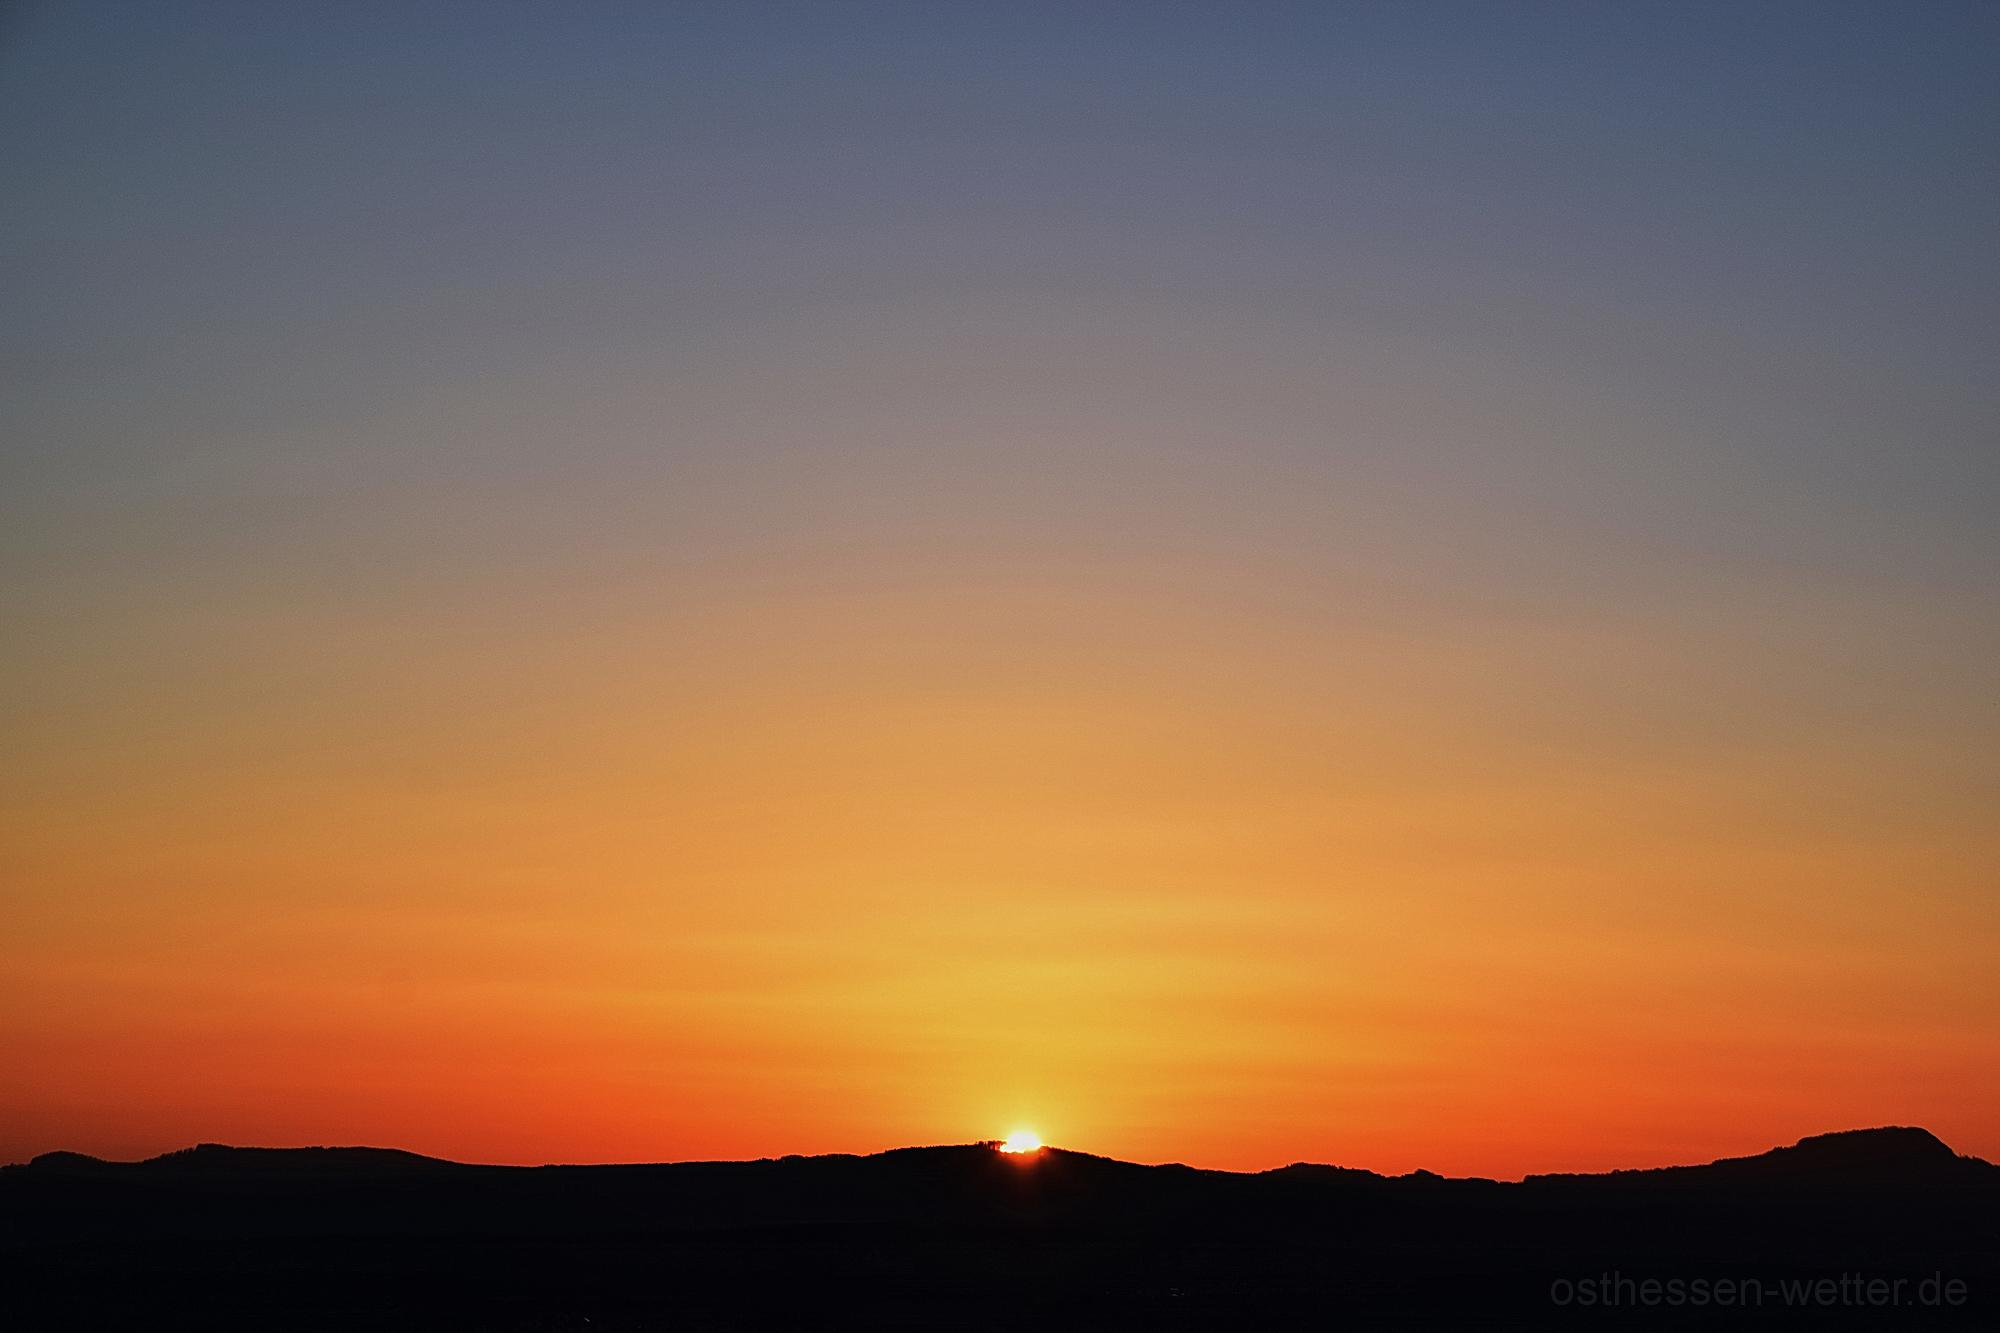 Sonnenaufgang am 25.03.2020 um 06:20:46 CET